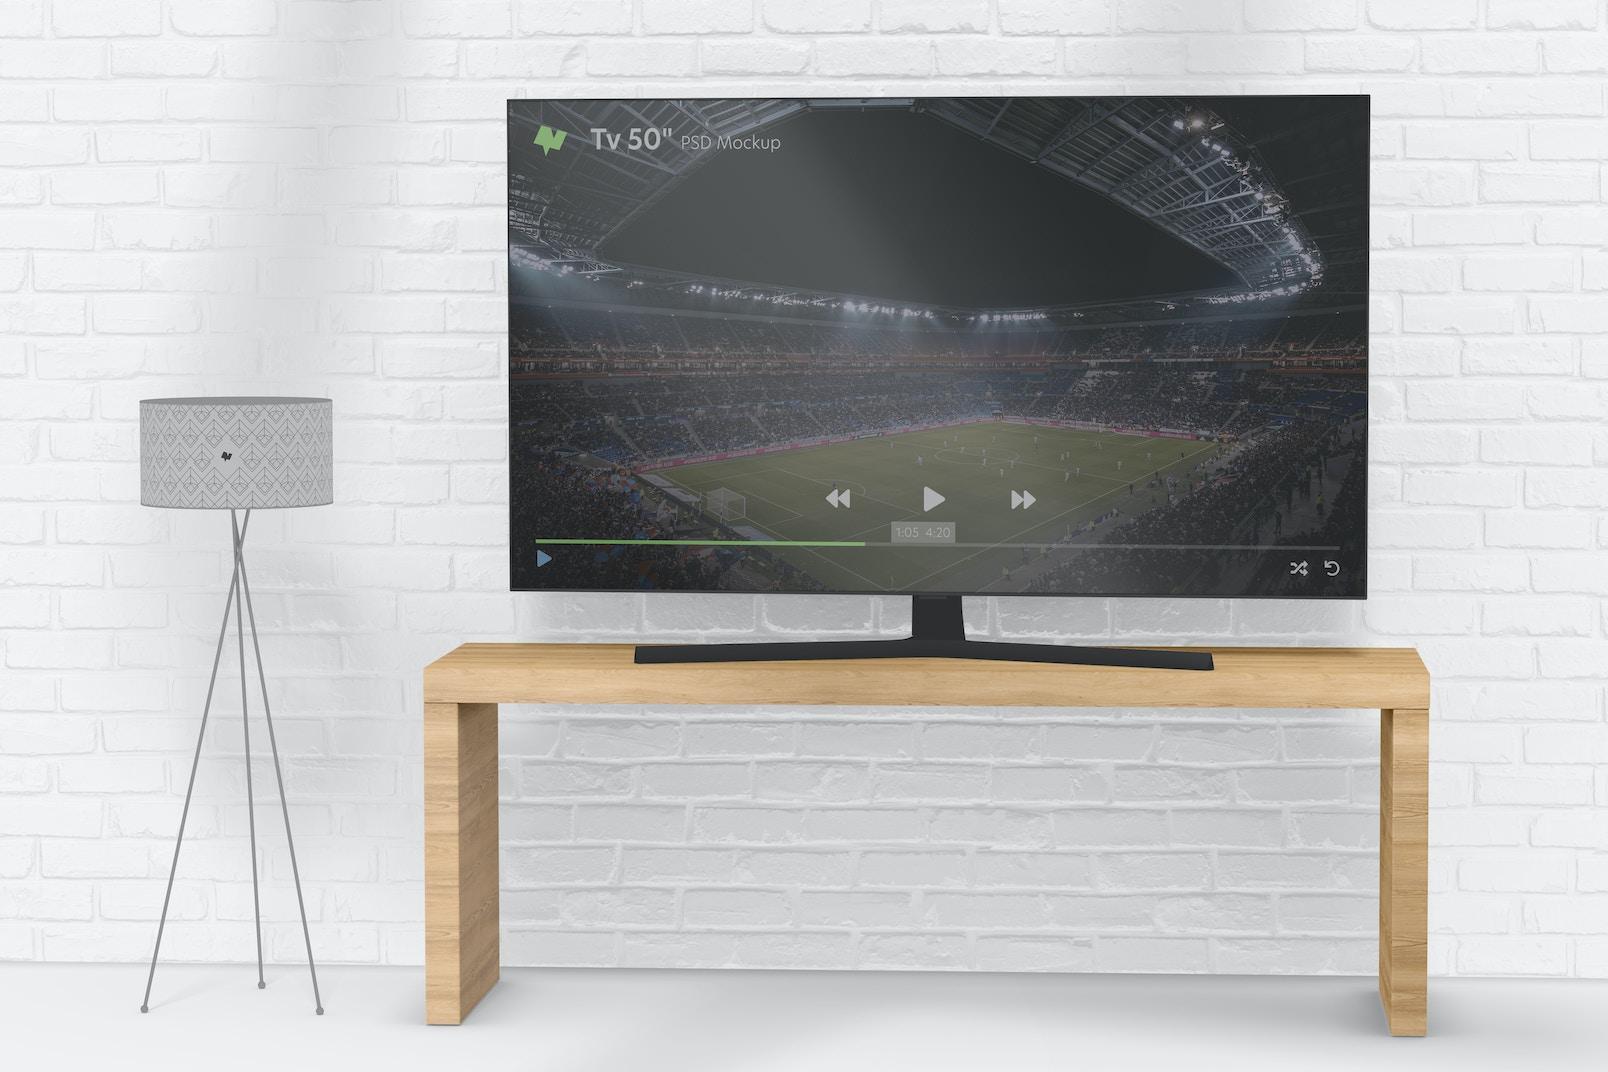 "Tv 50"" Mockup, On Surface"